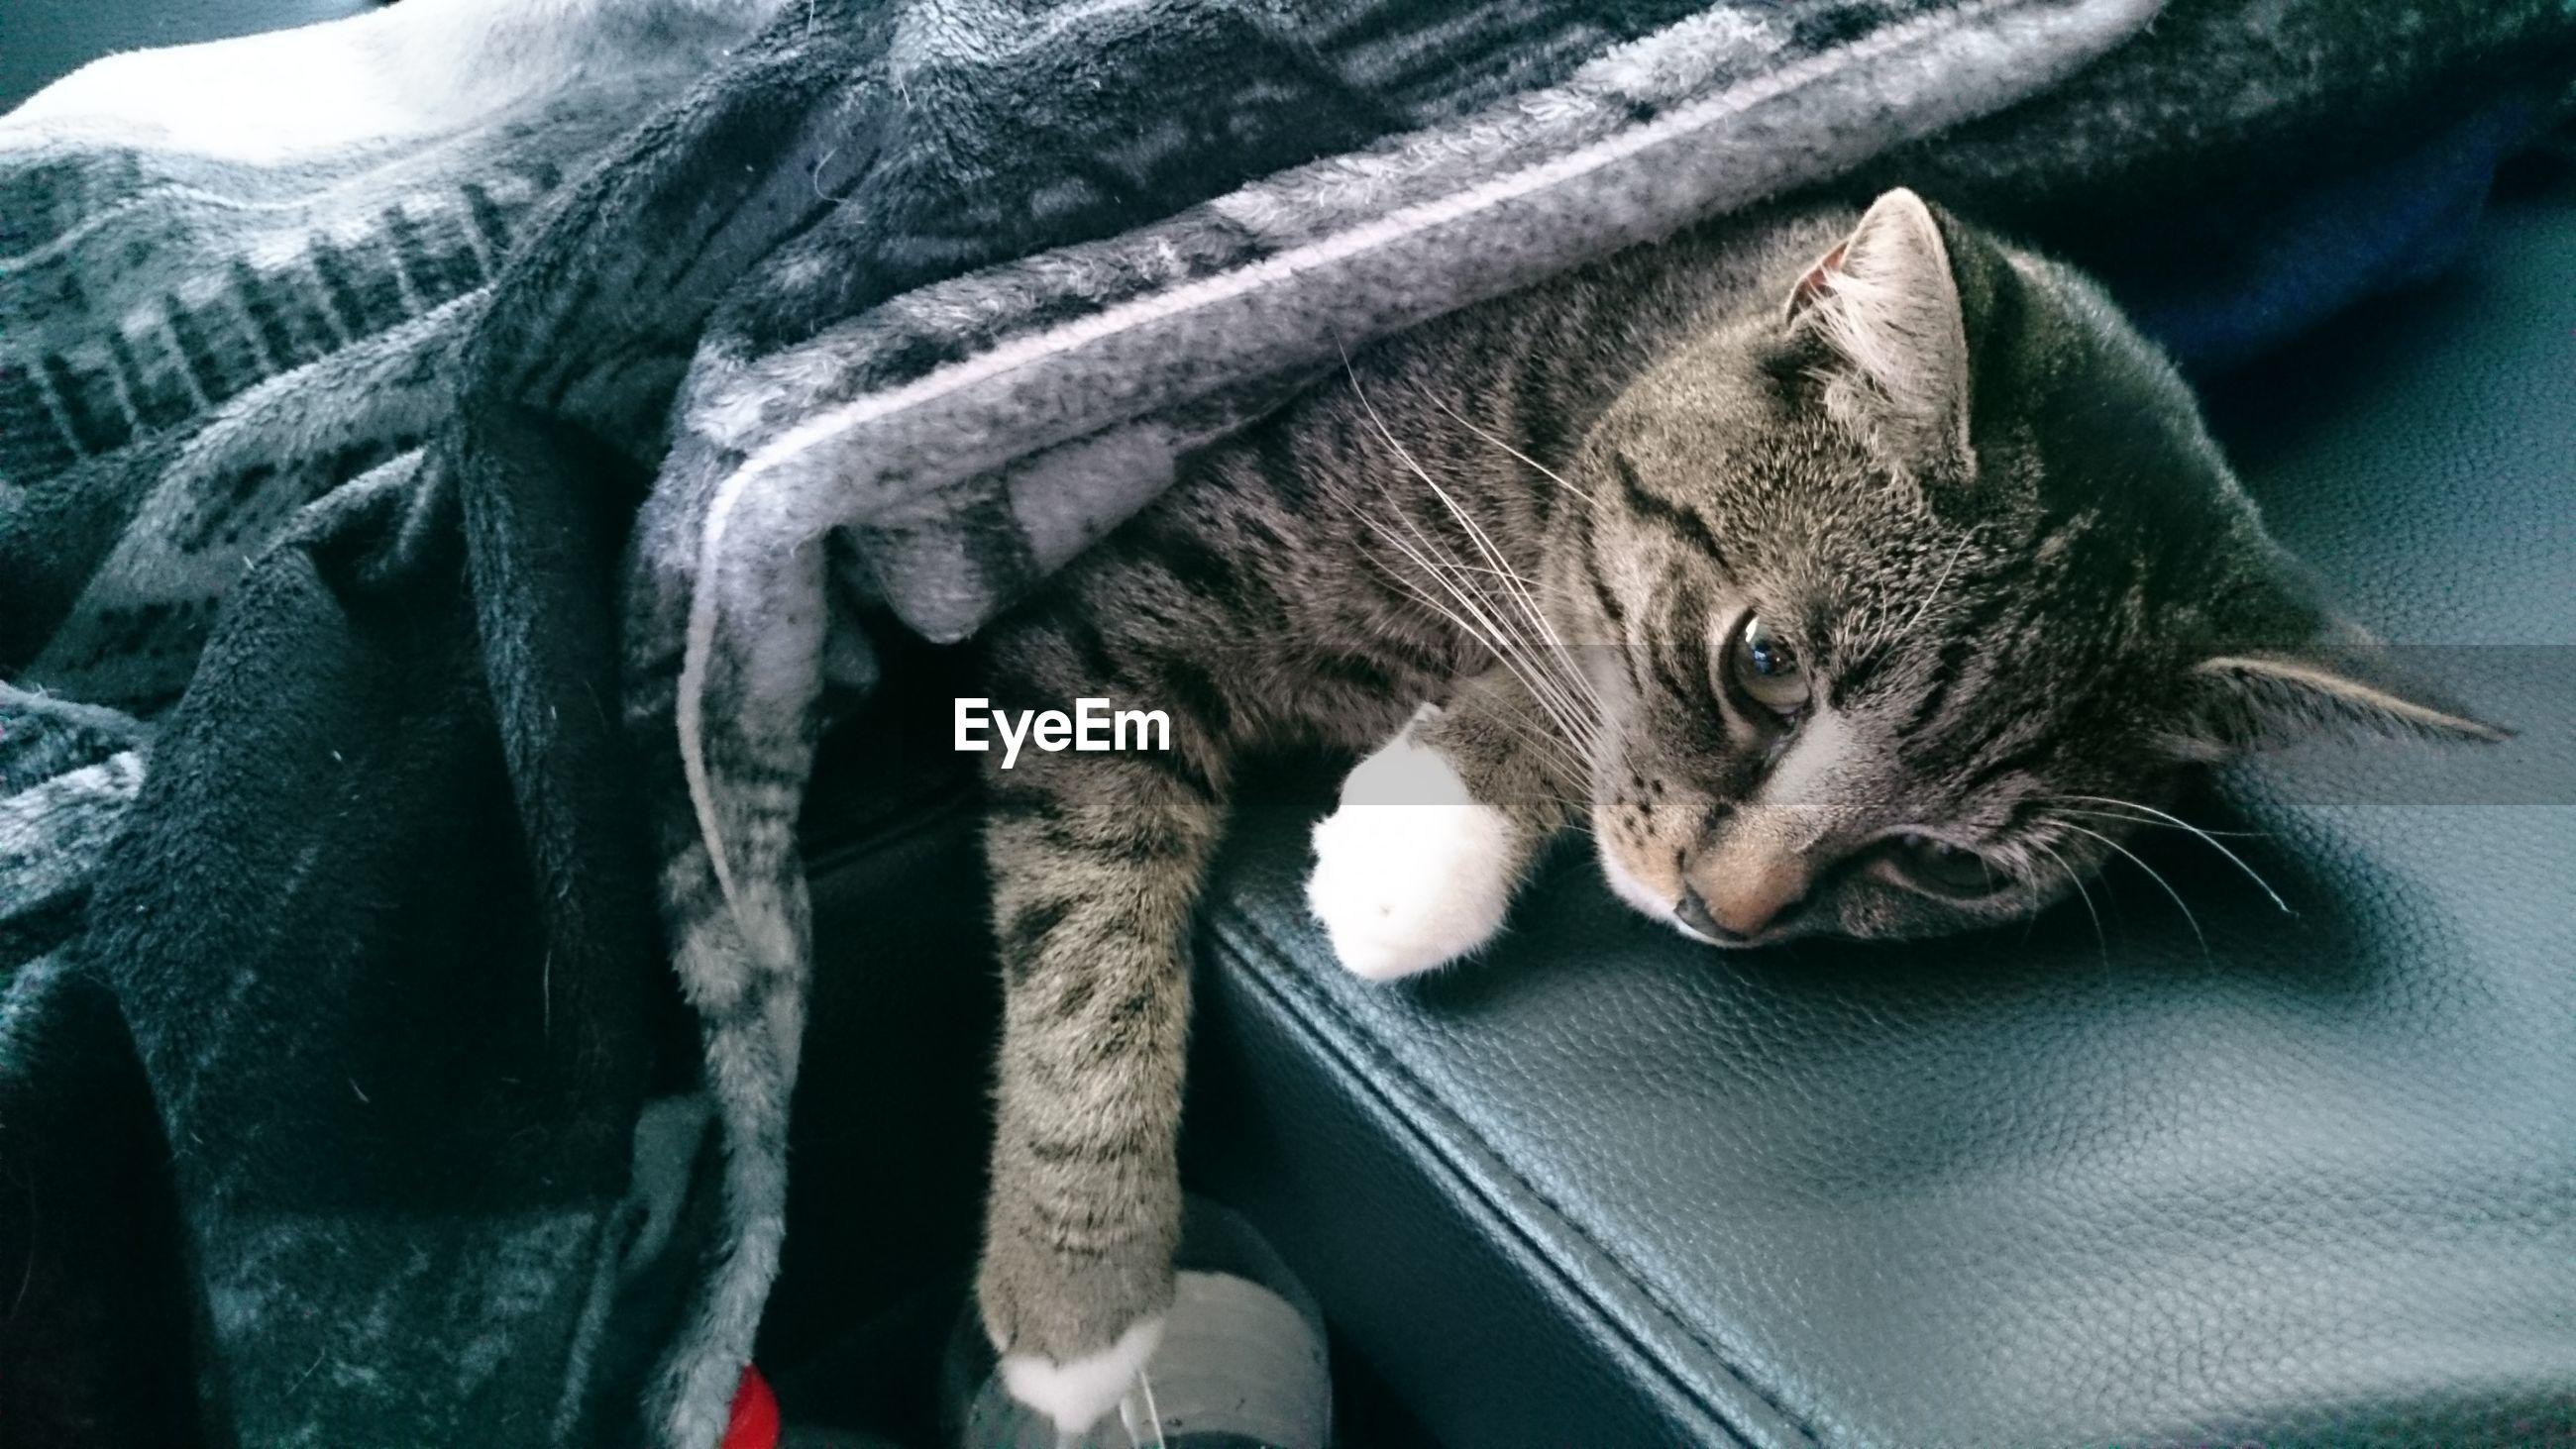 CLOSE-UP OF CAT SITTING ON CARPET